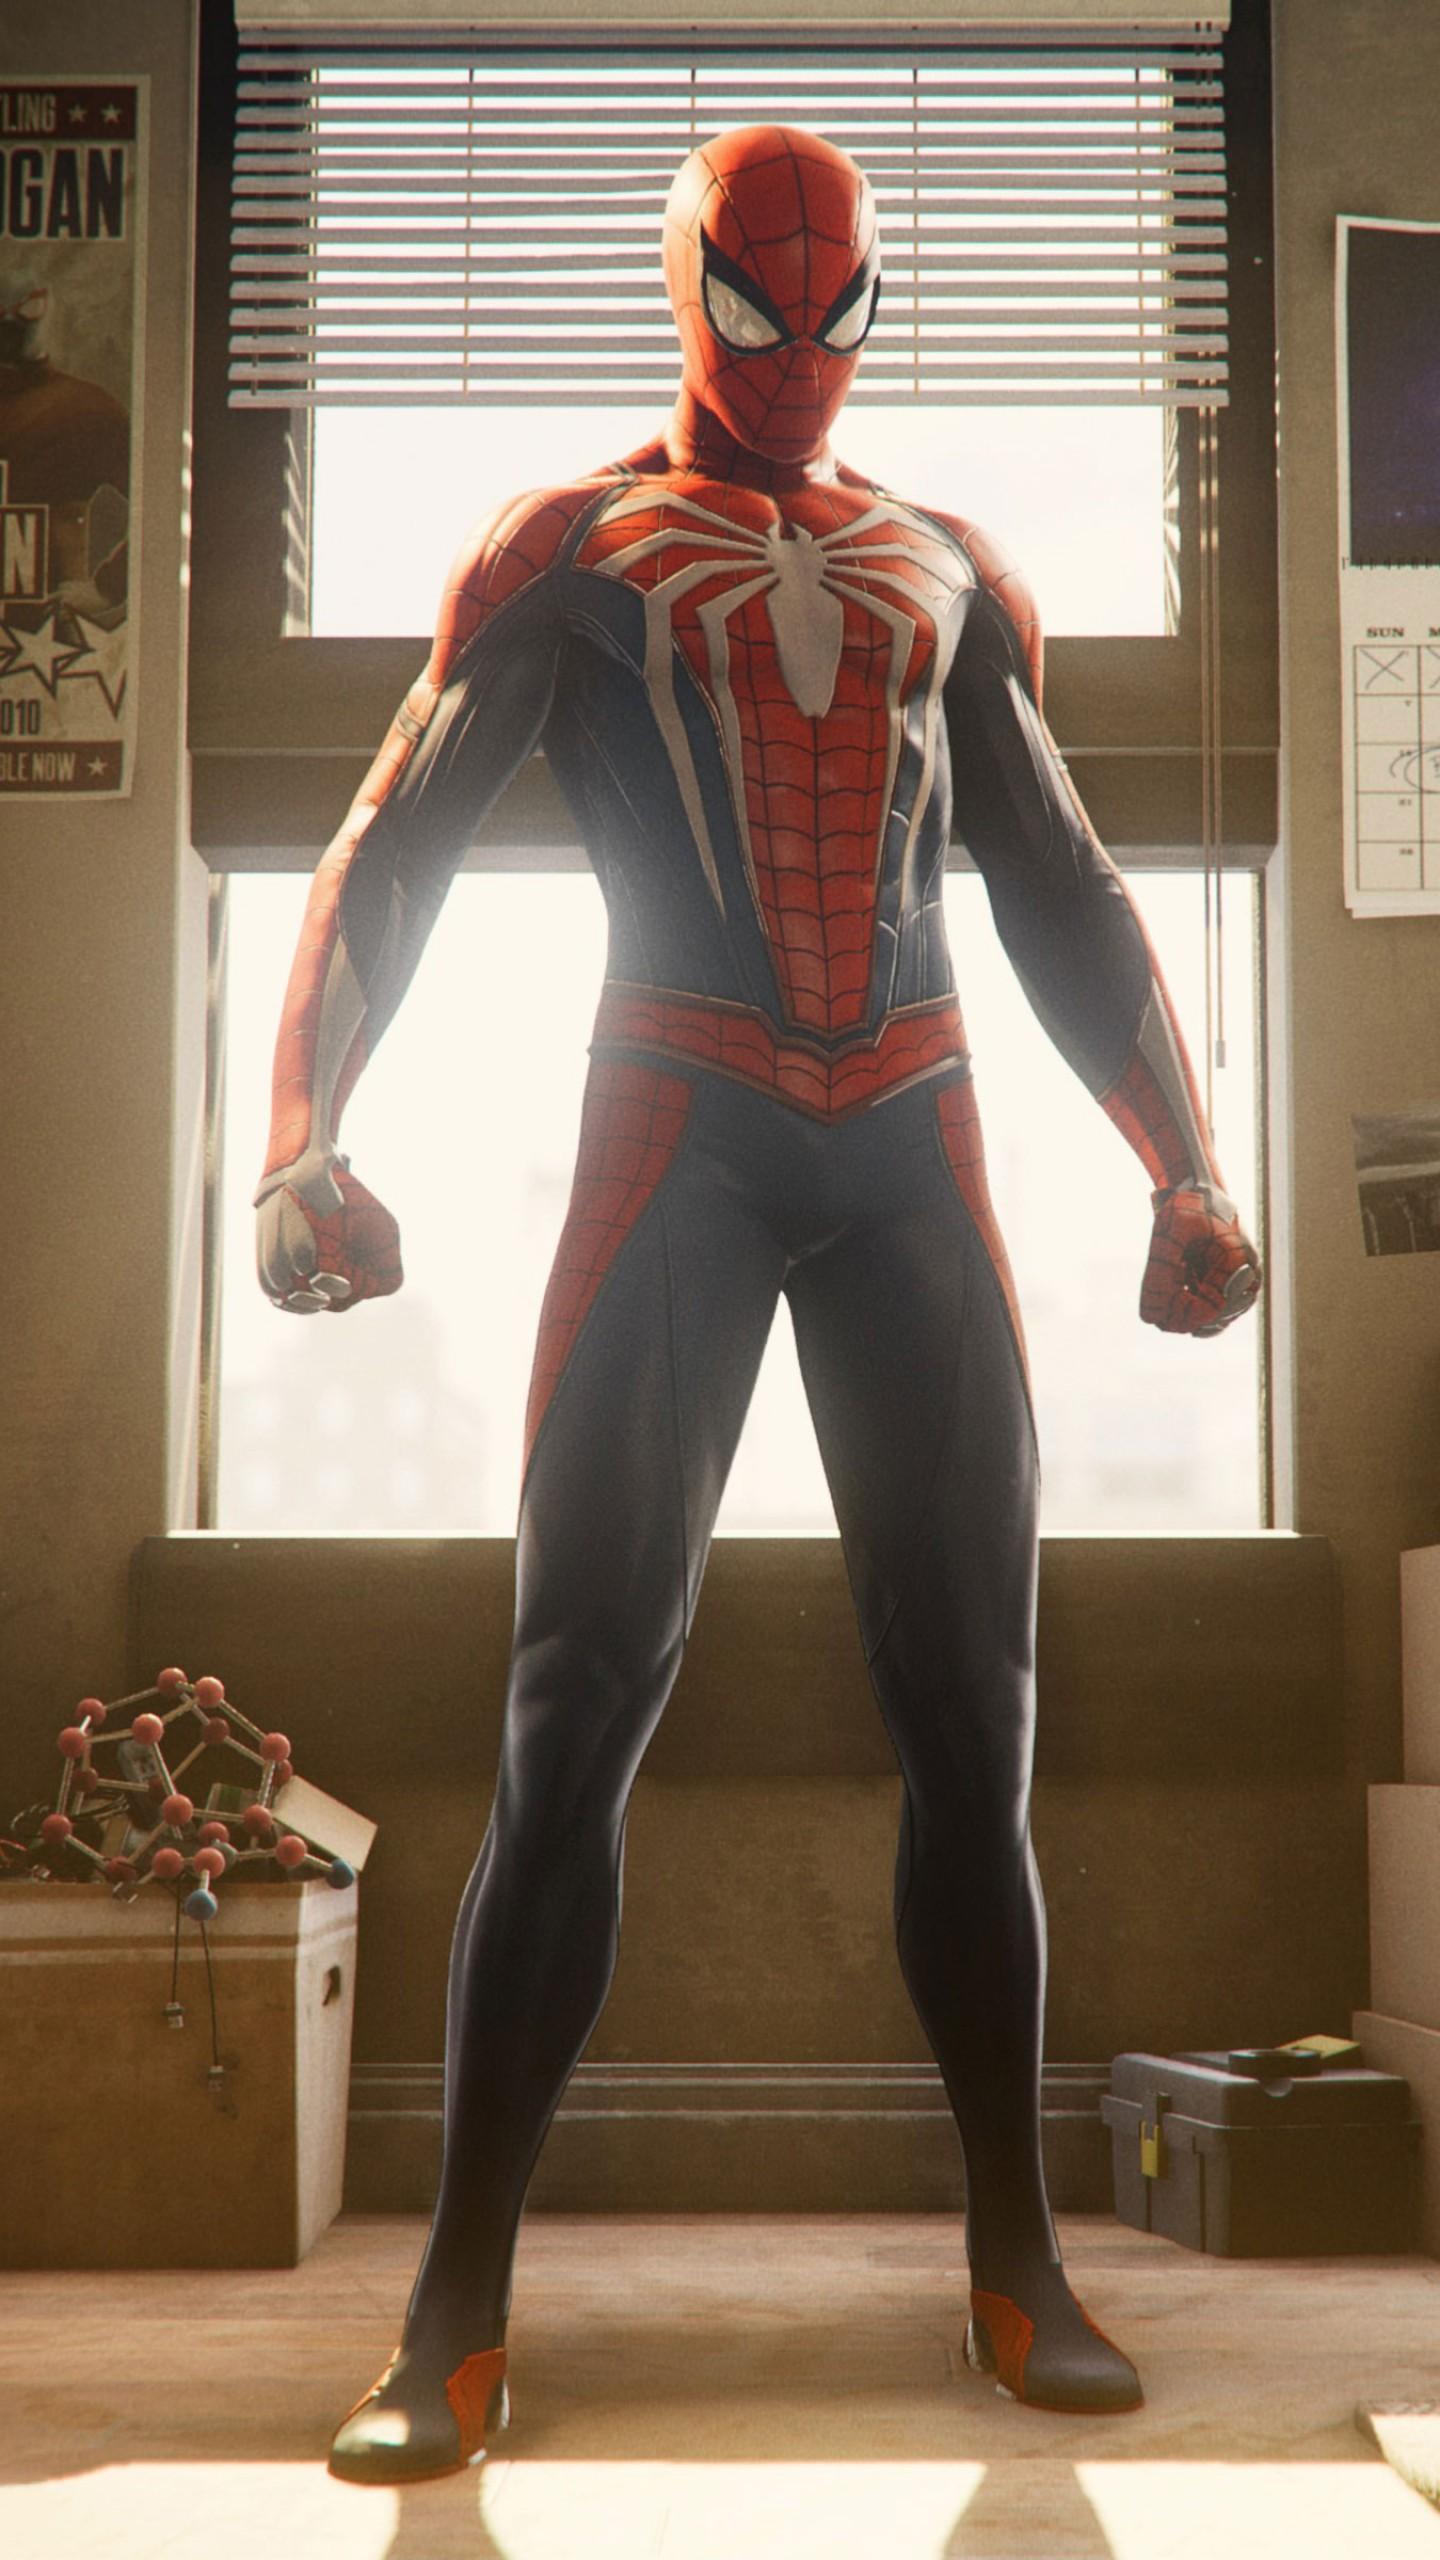 Spiderman Wallpaper Game